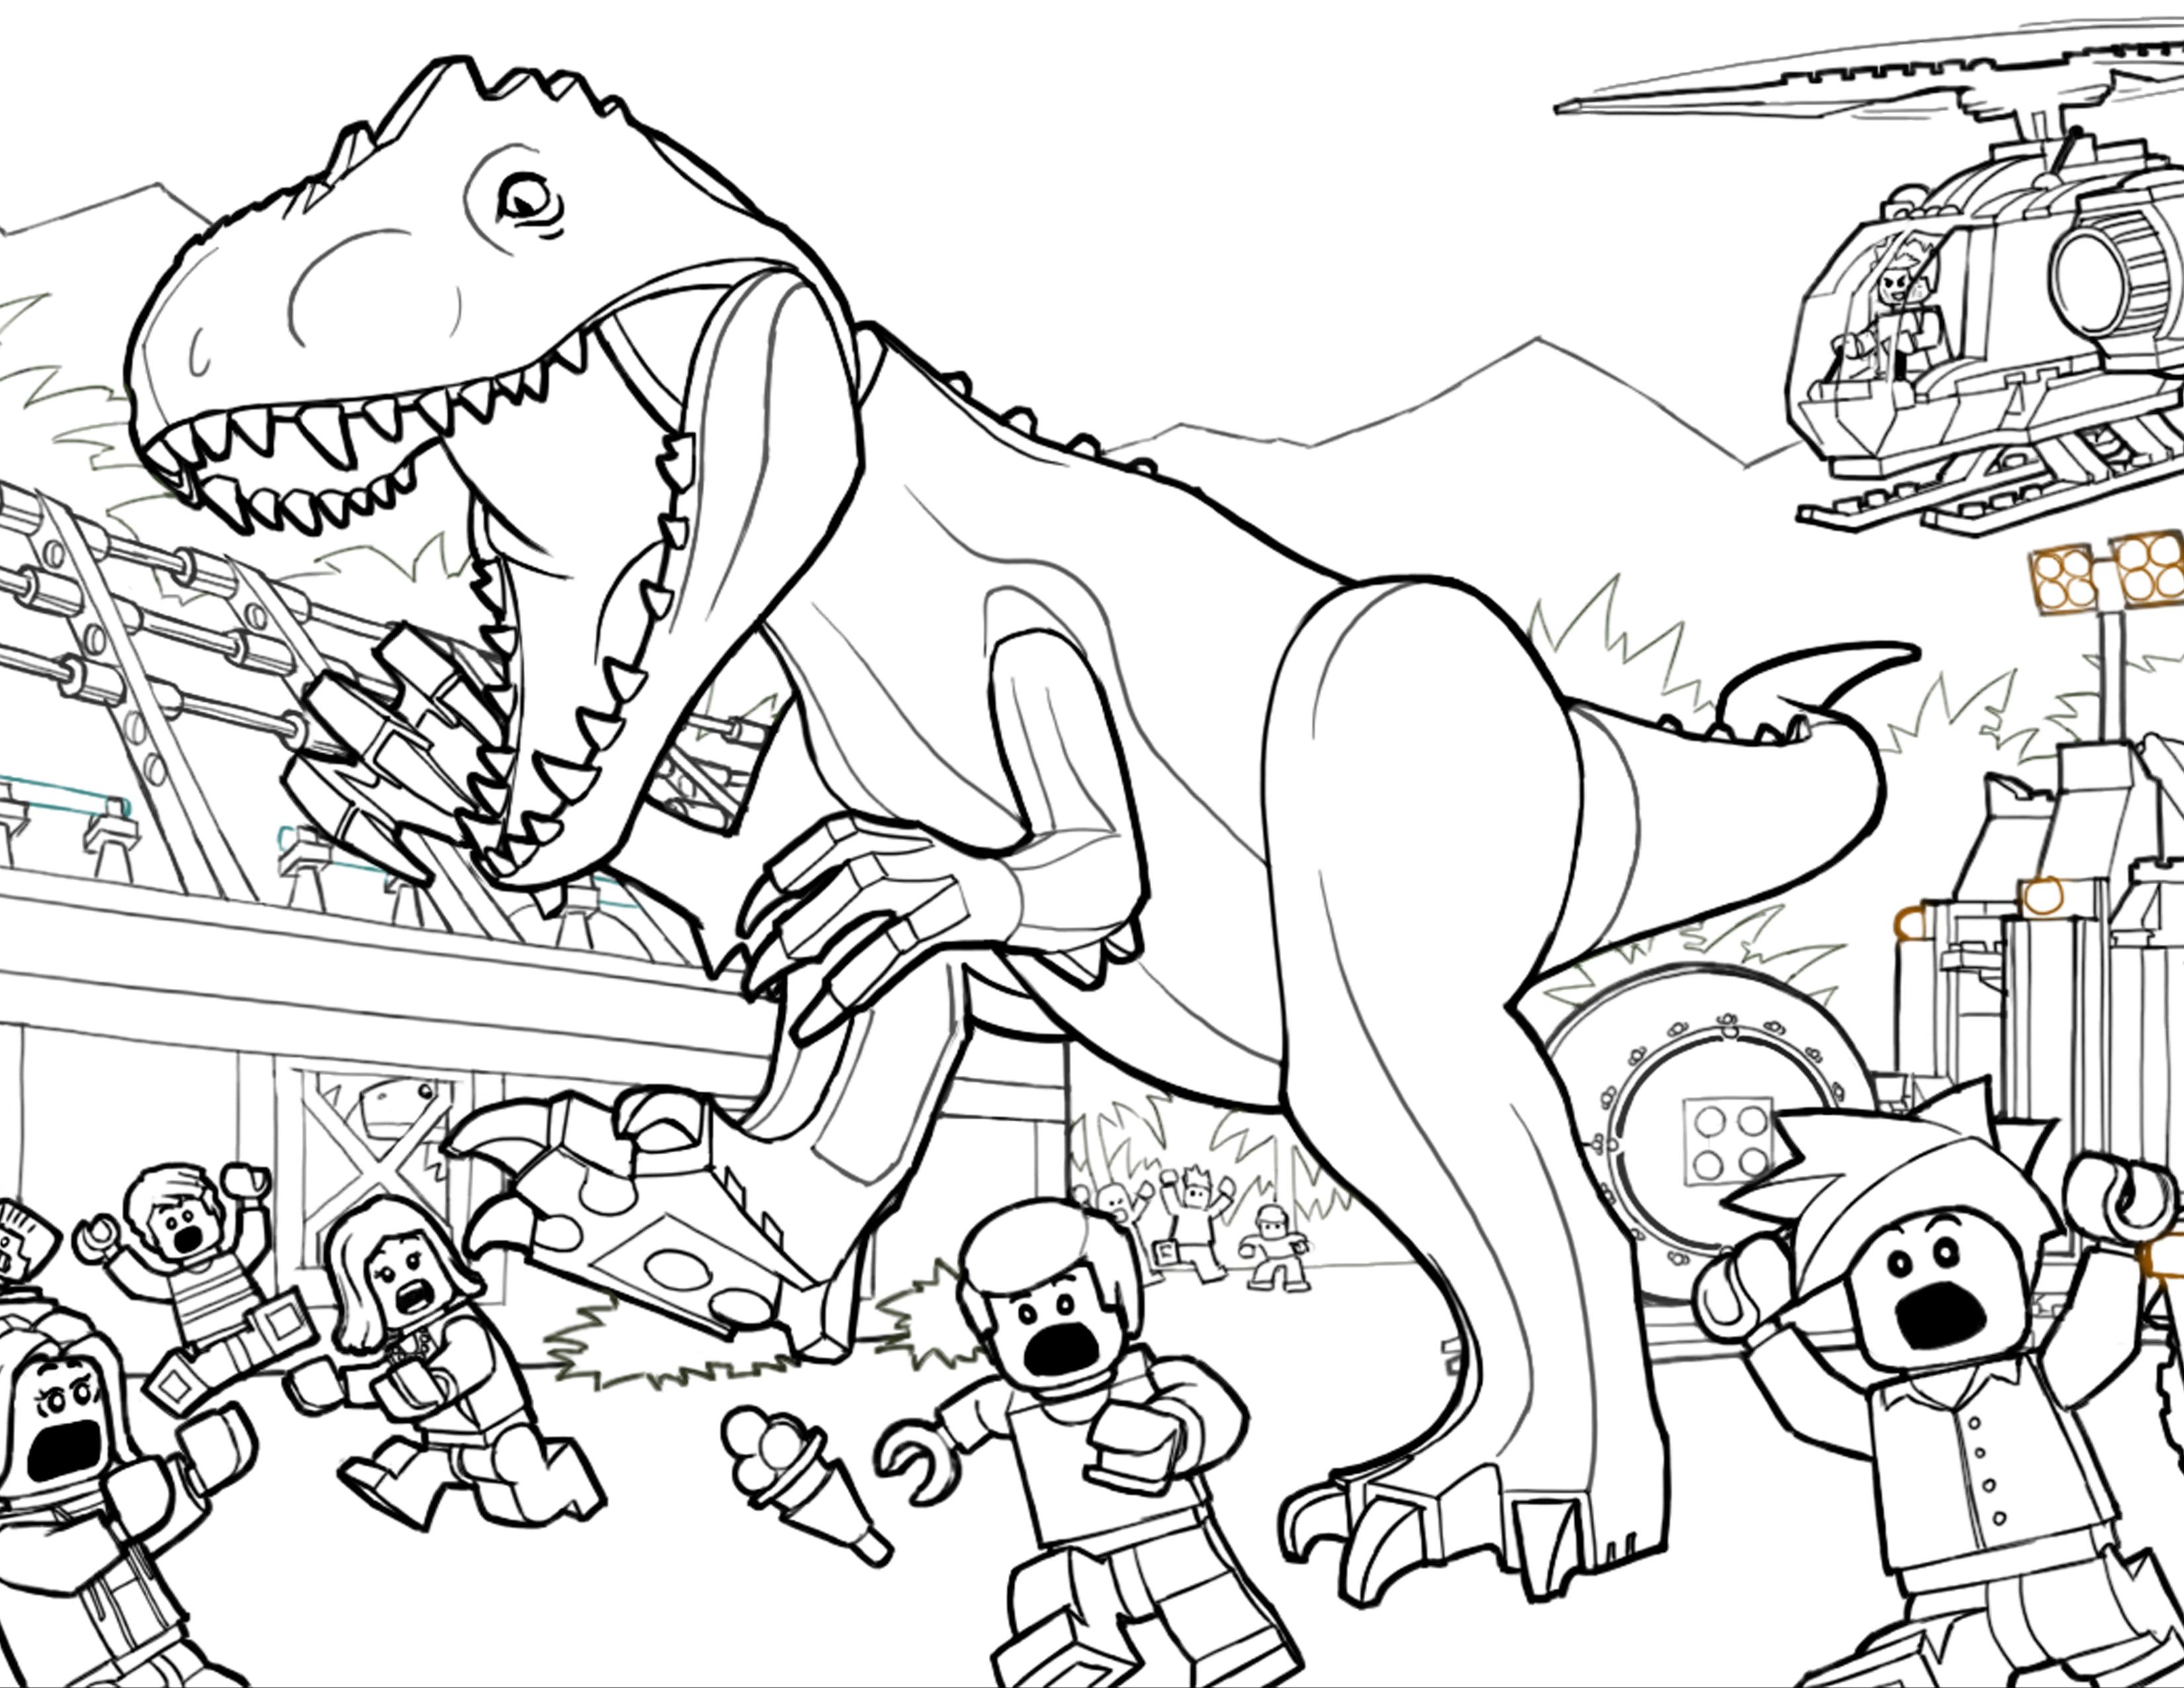 Ausmalbilder Lego Jurassic World | Ausmalbilder Jurassic World